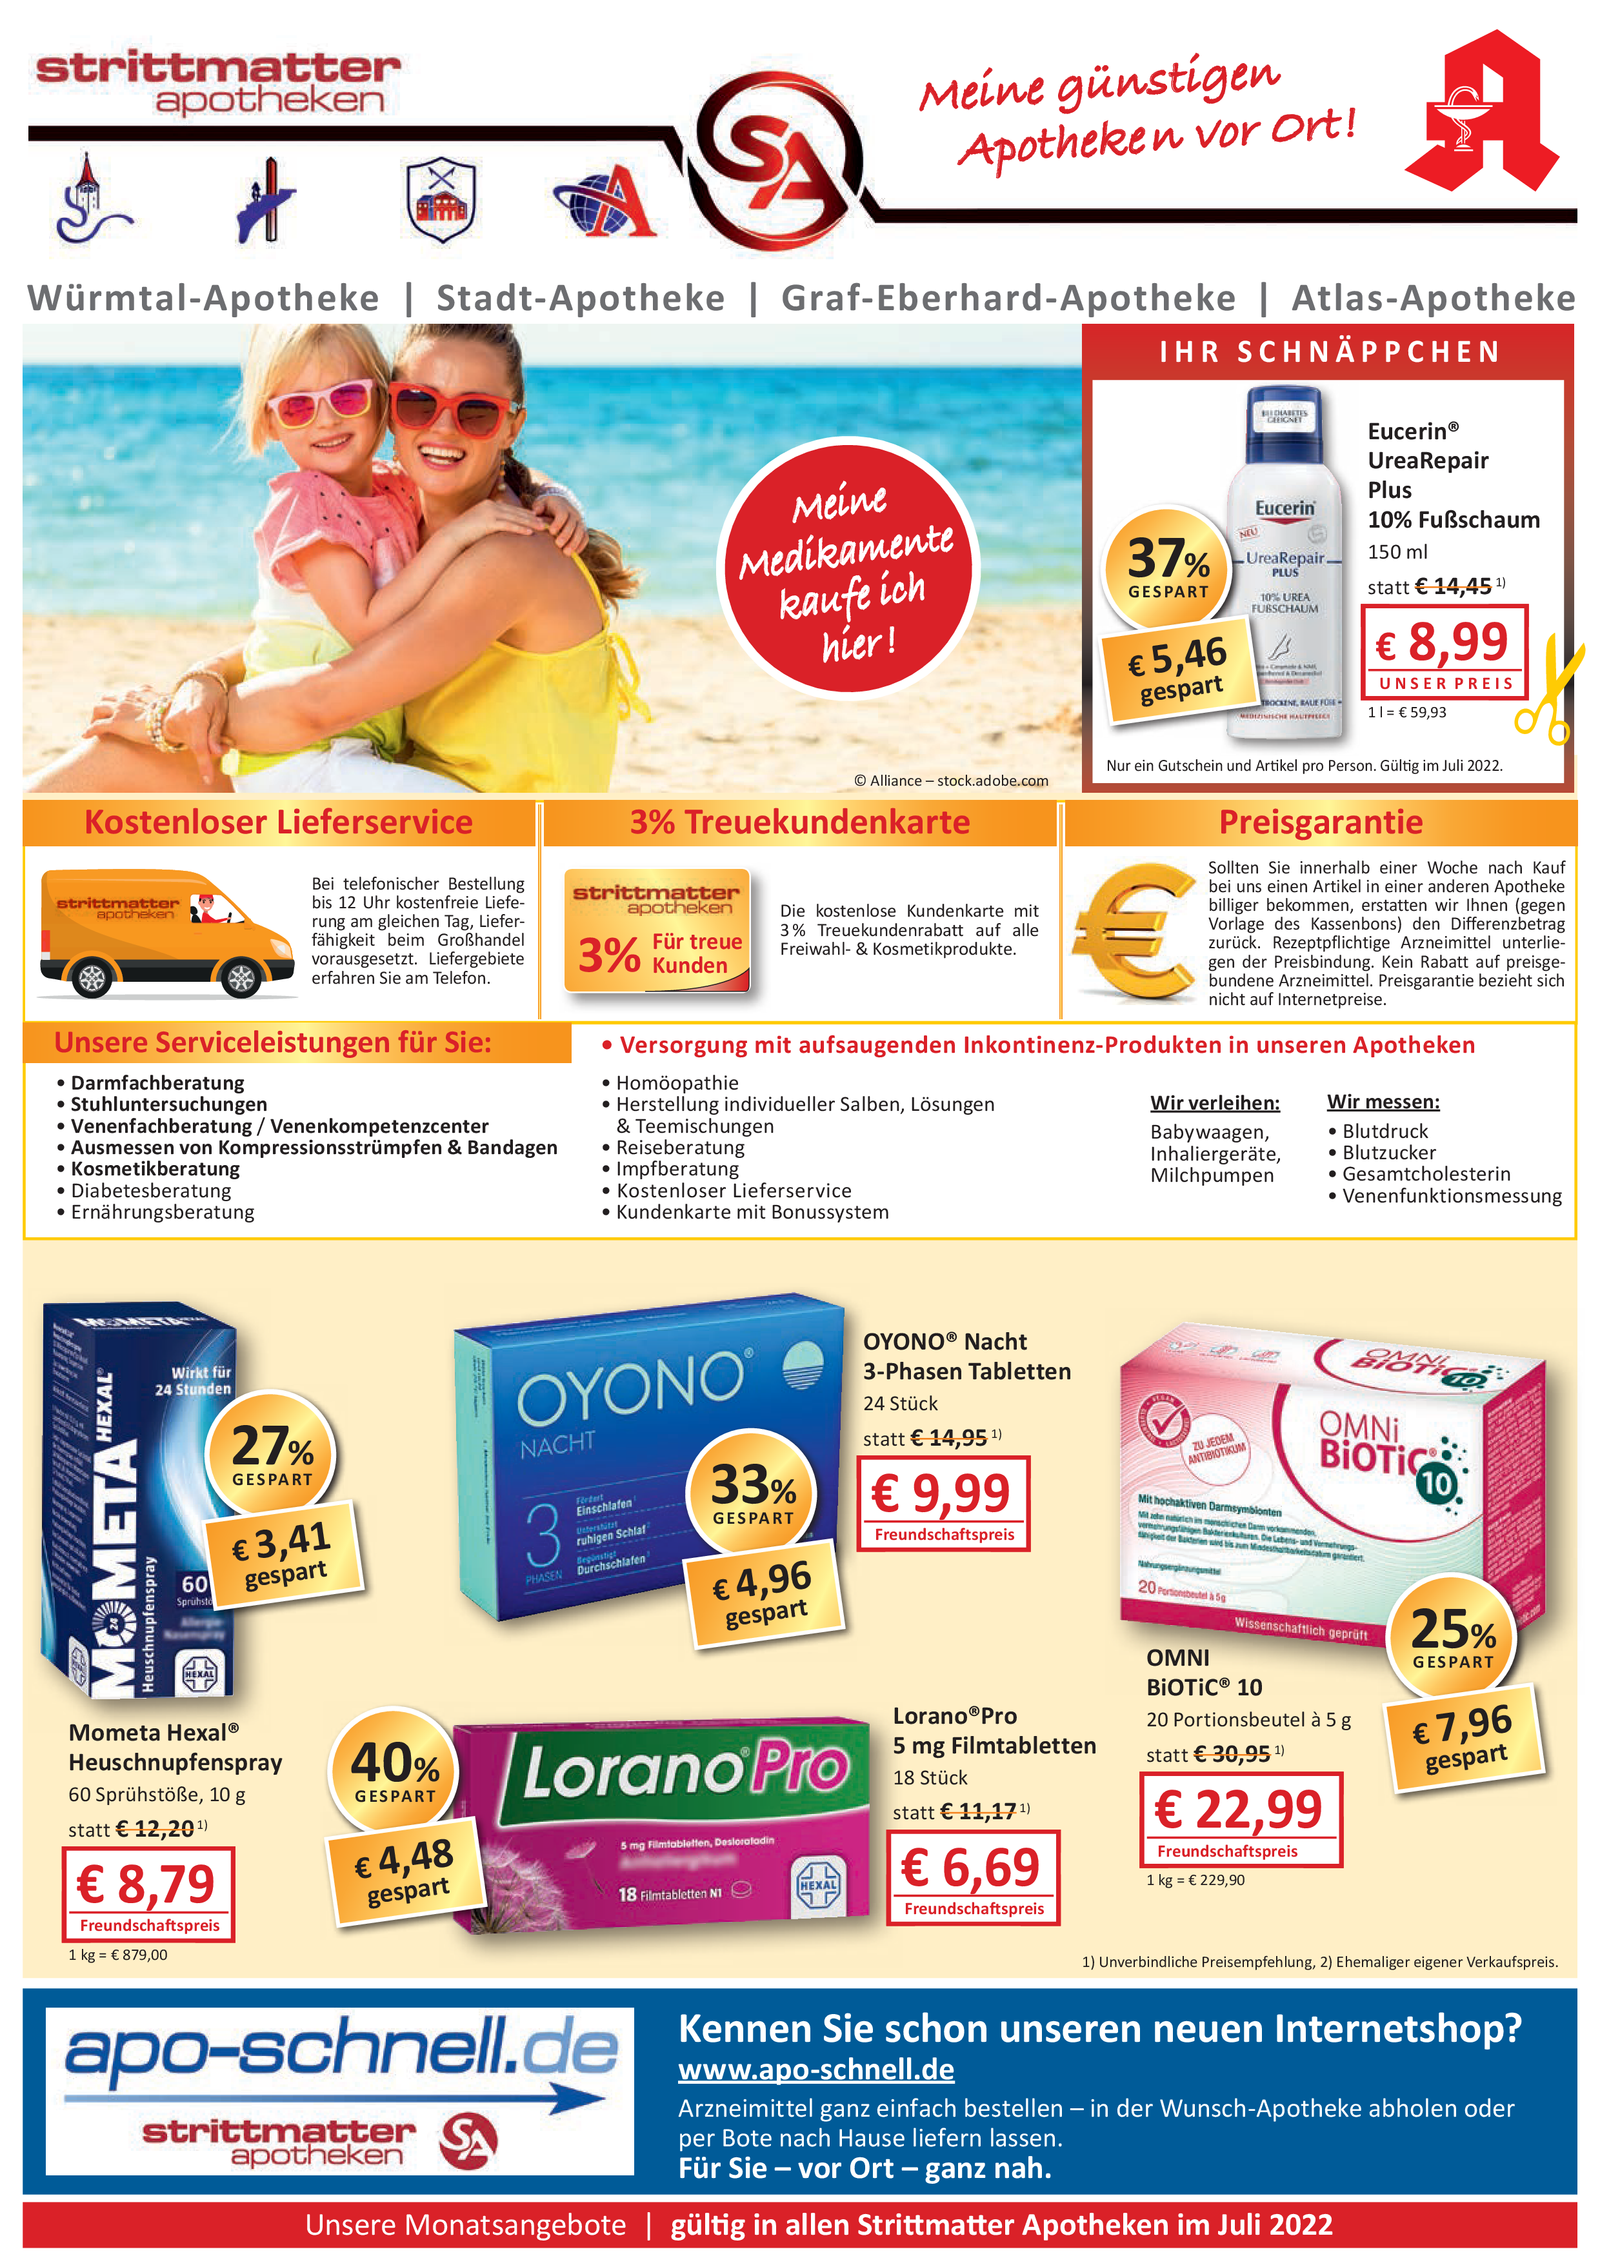 https://mein-uploads.apocdn.net/9824/leaflets/9824_flyer-Seite1.png